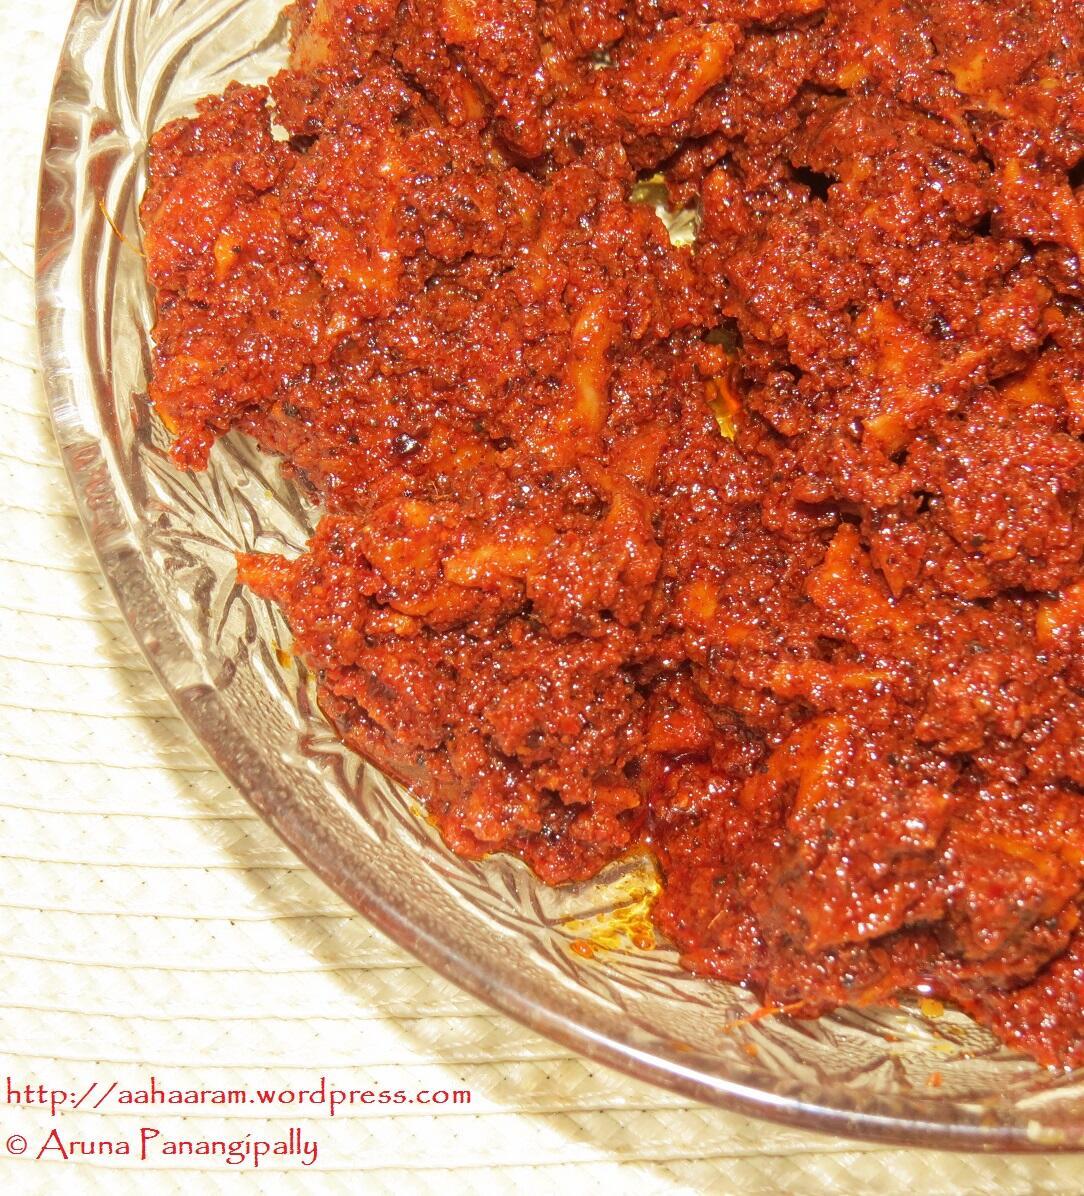 Magai is an Andhra Mango Pickle made with sun-dried mango pieces, roasted fenugreek powder (methi powder), and chilli powder.